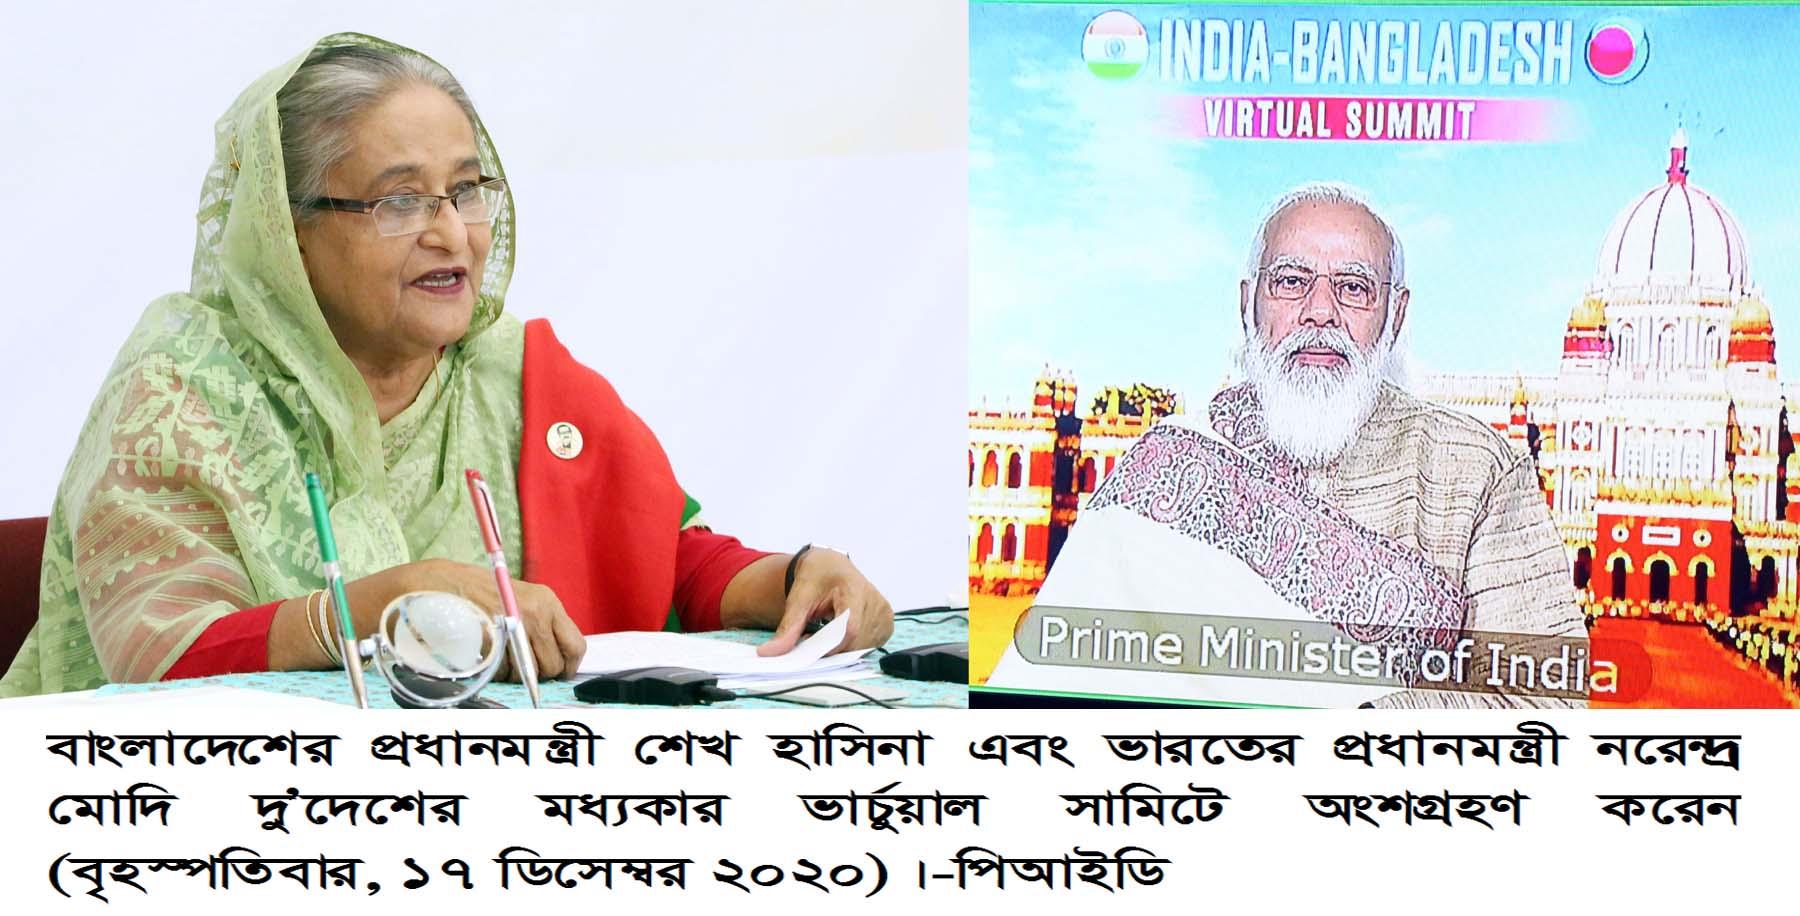 Sheikh Hasina, Narendra Modi interact over video conference